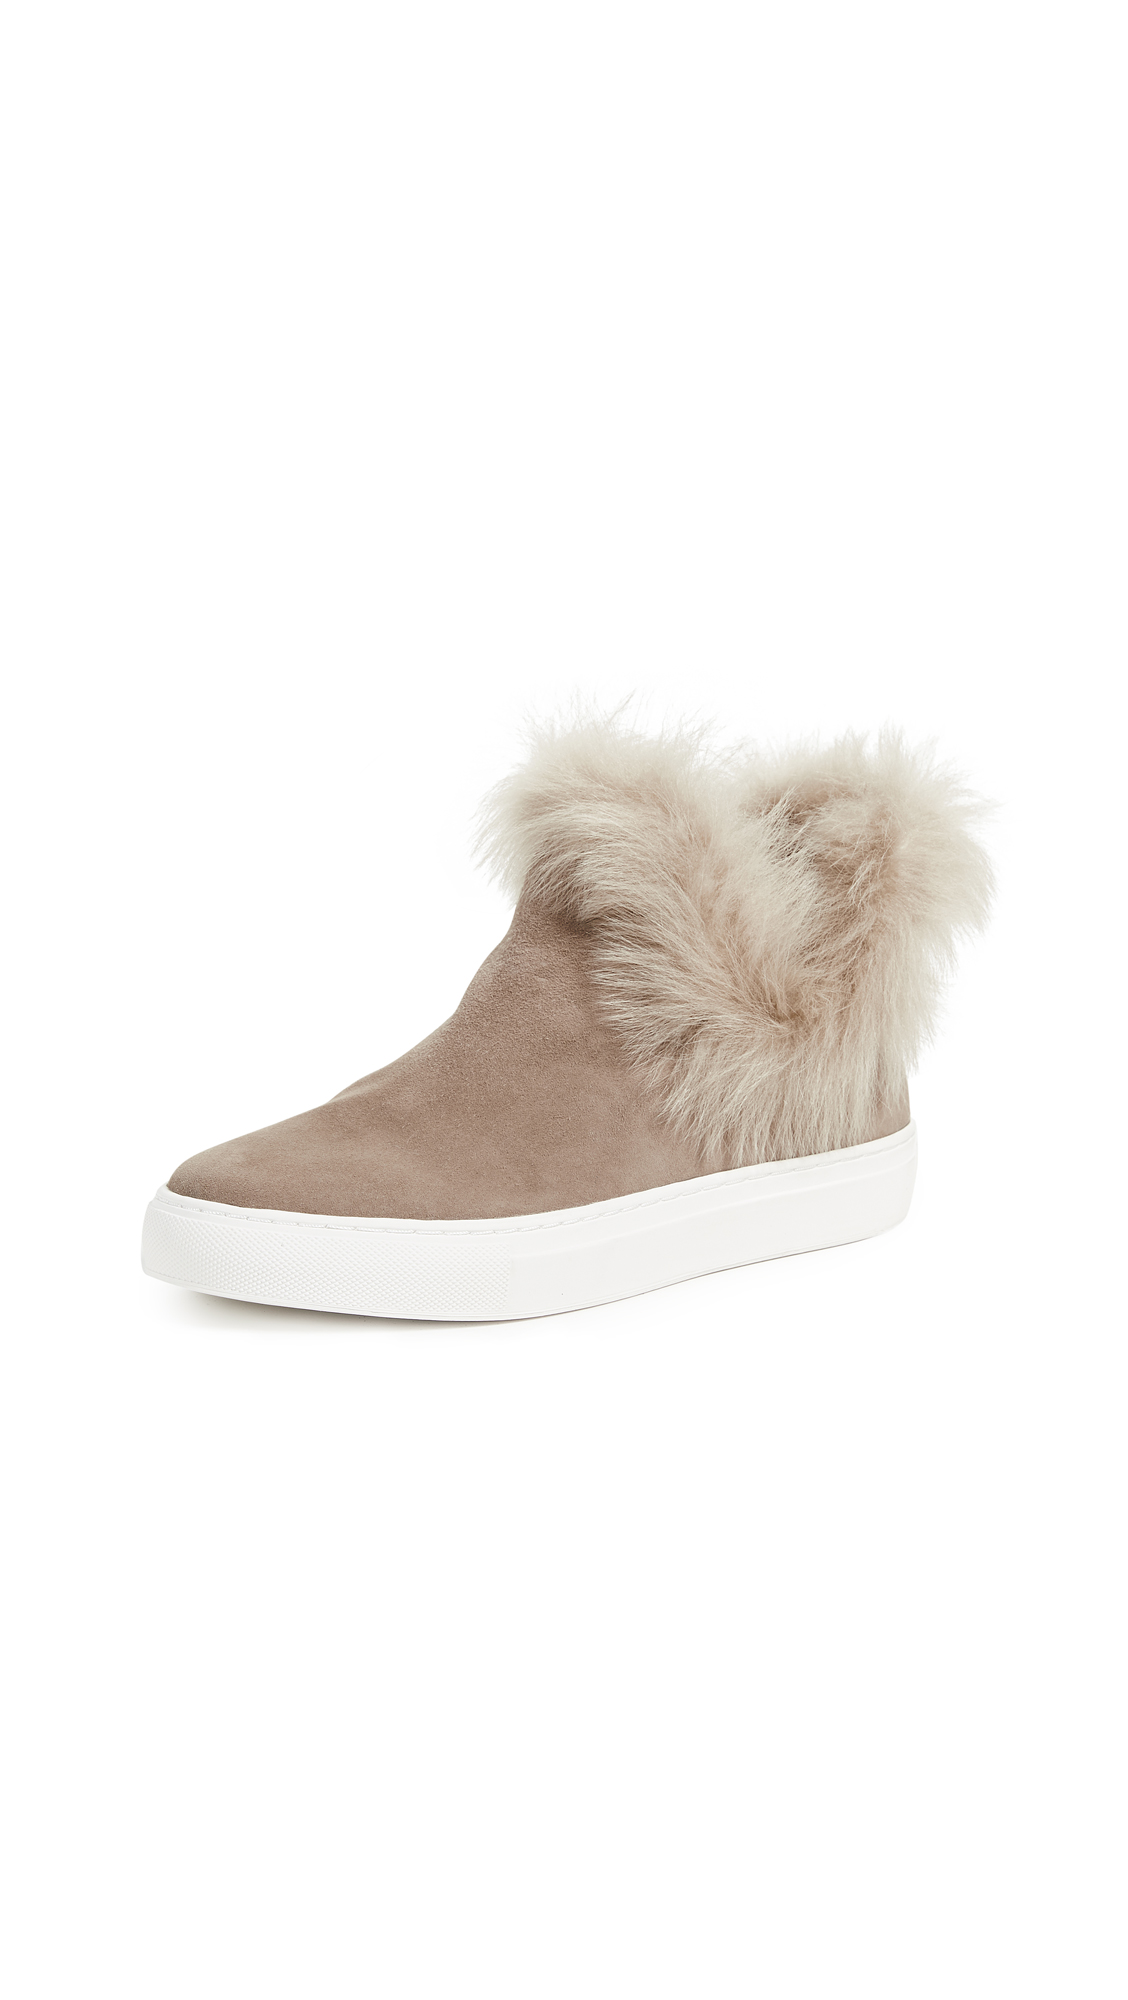 Rachel Zoe Brooklyn Bootie Sneakers - Taupe